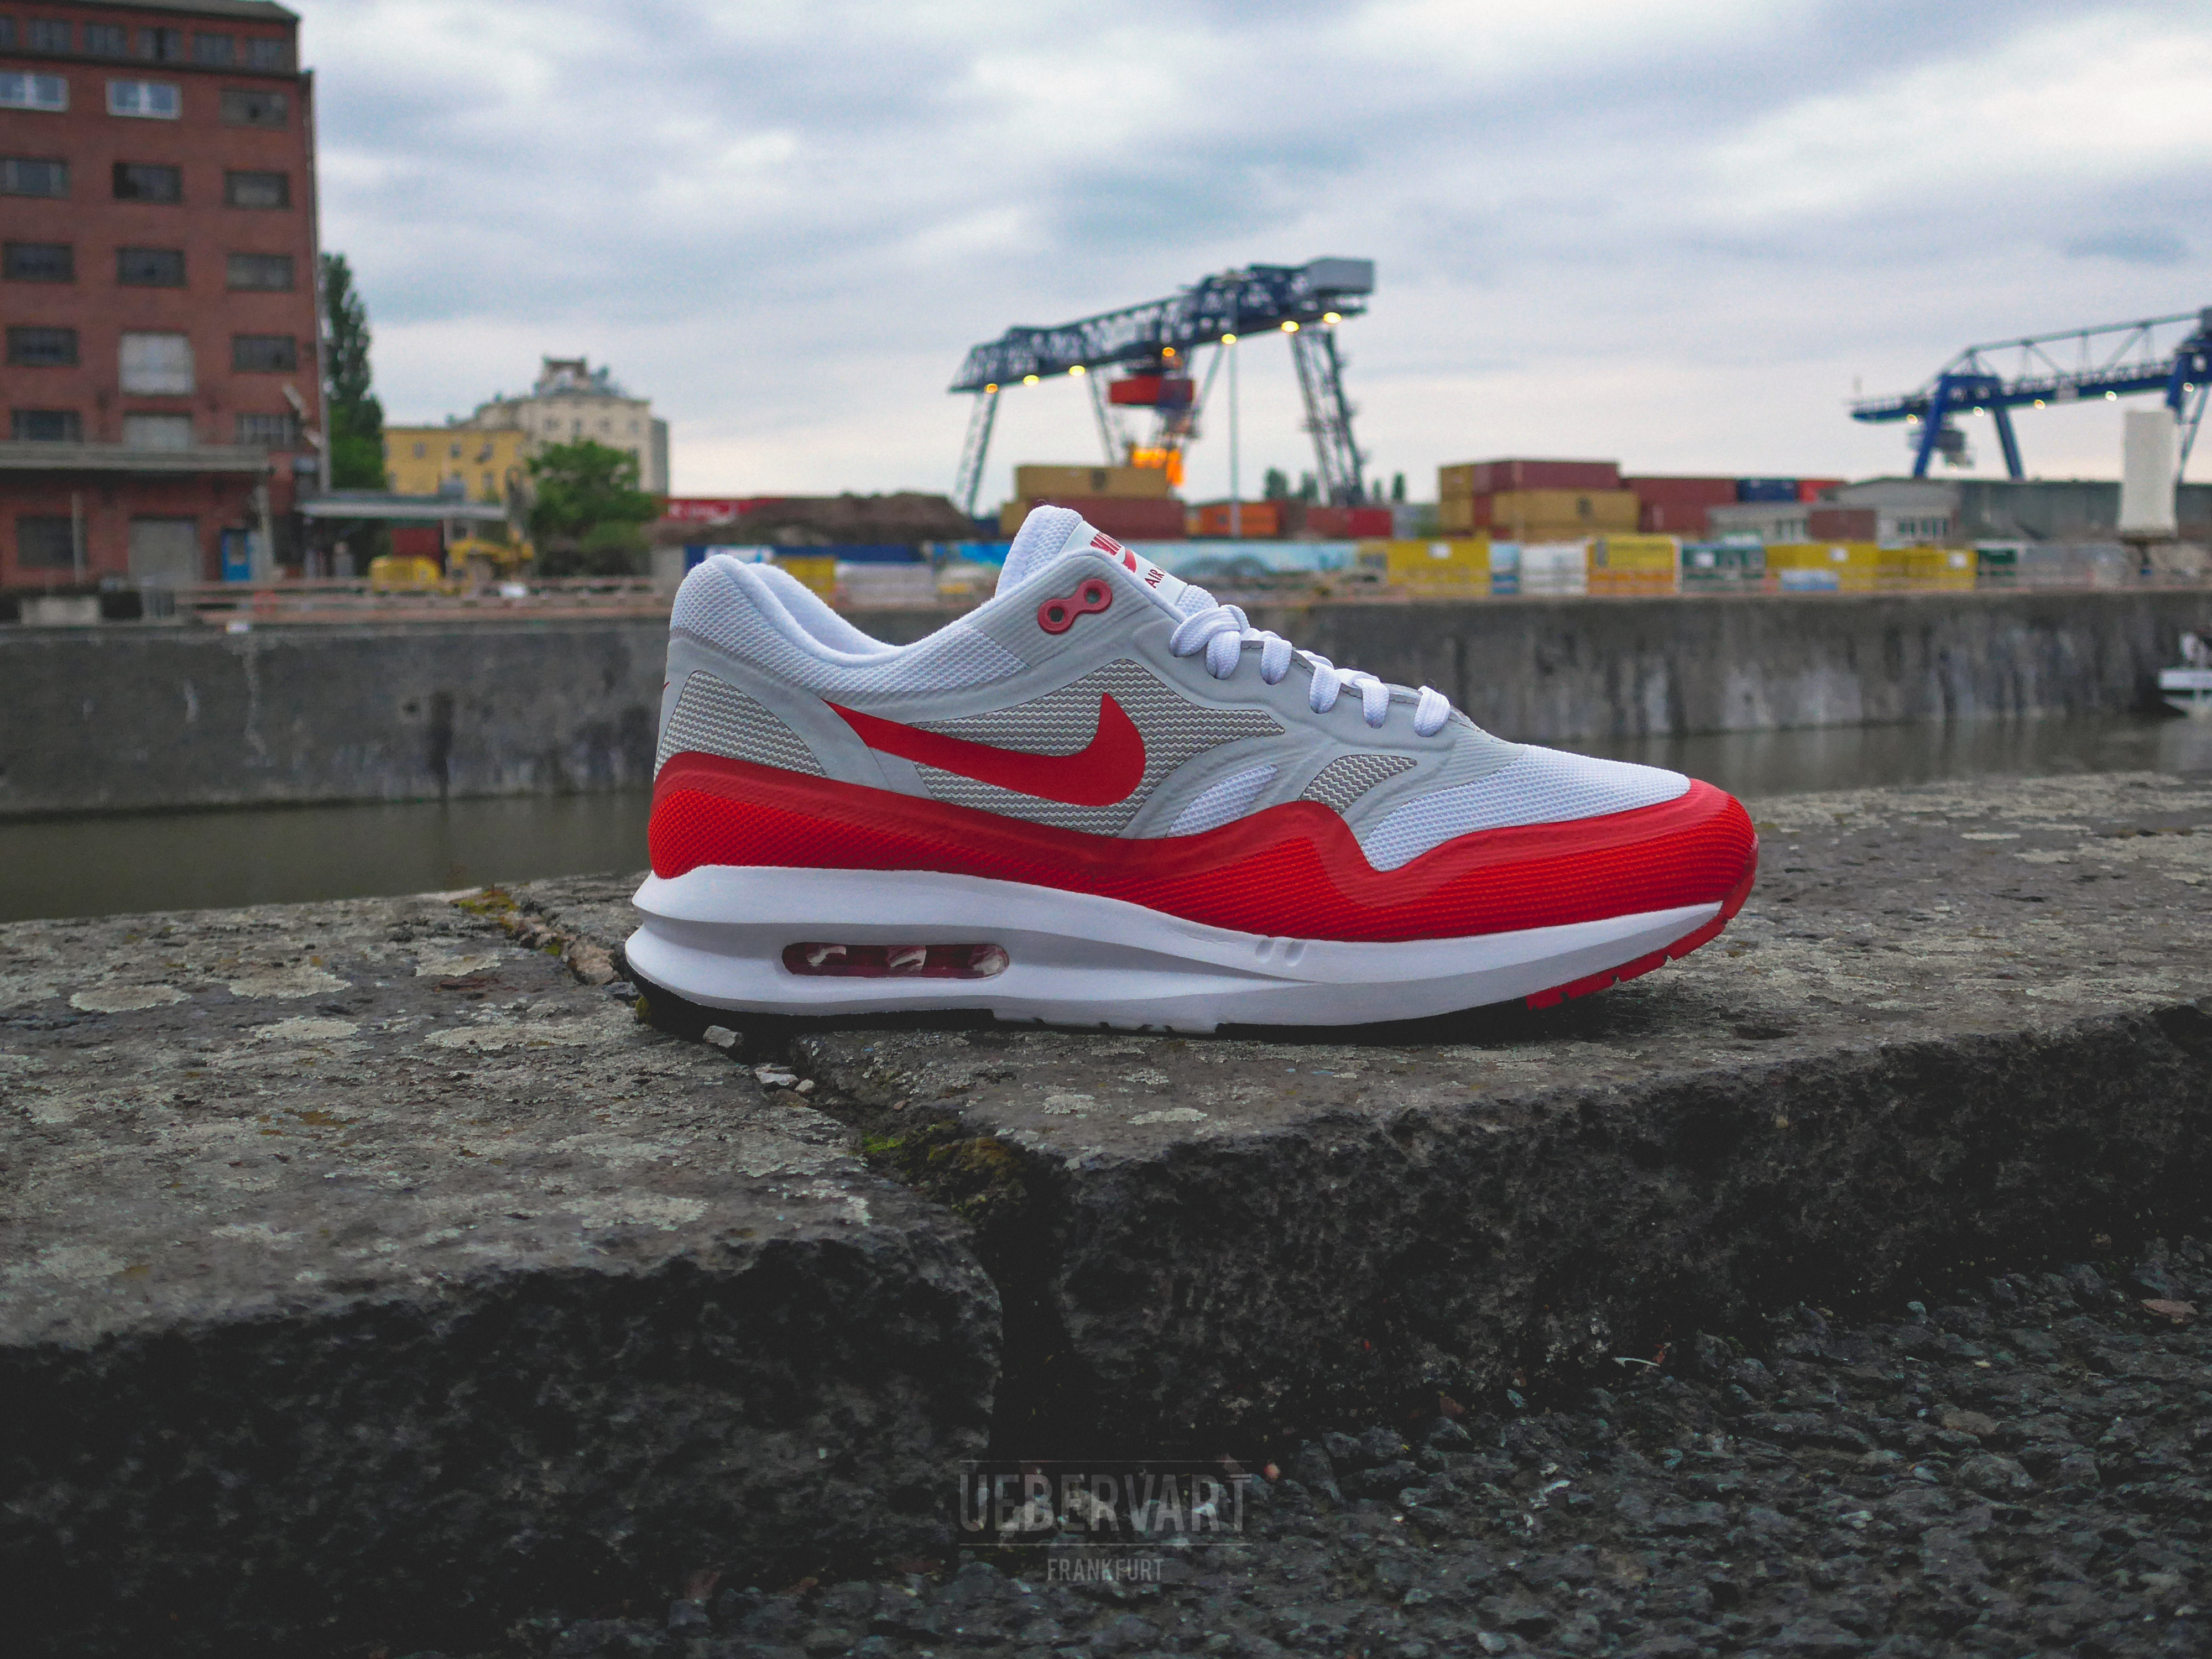 Nike Air Max Lunar 1 Chiling Red